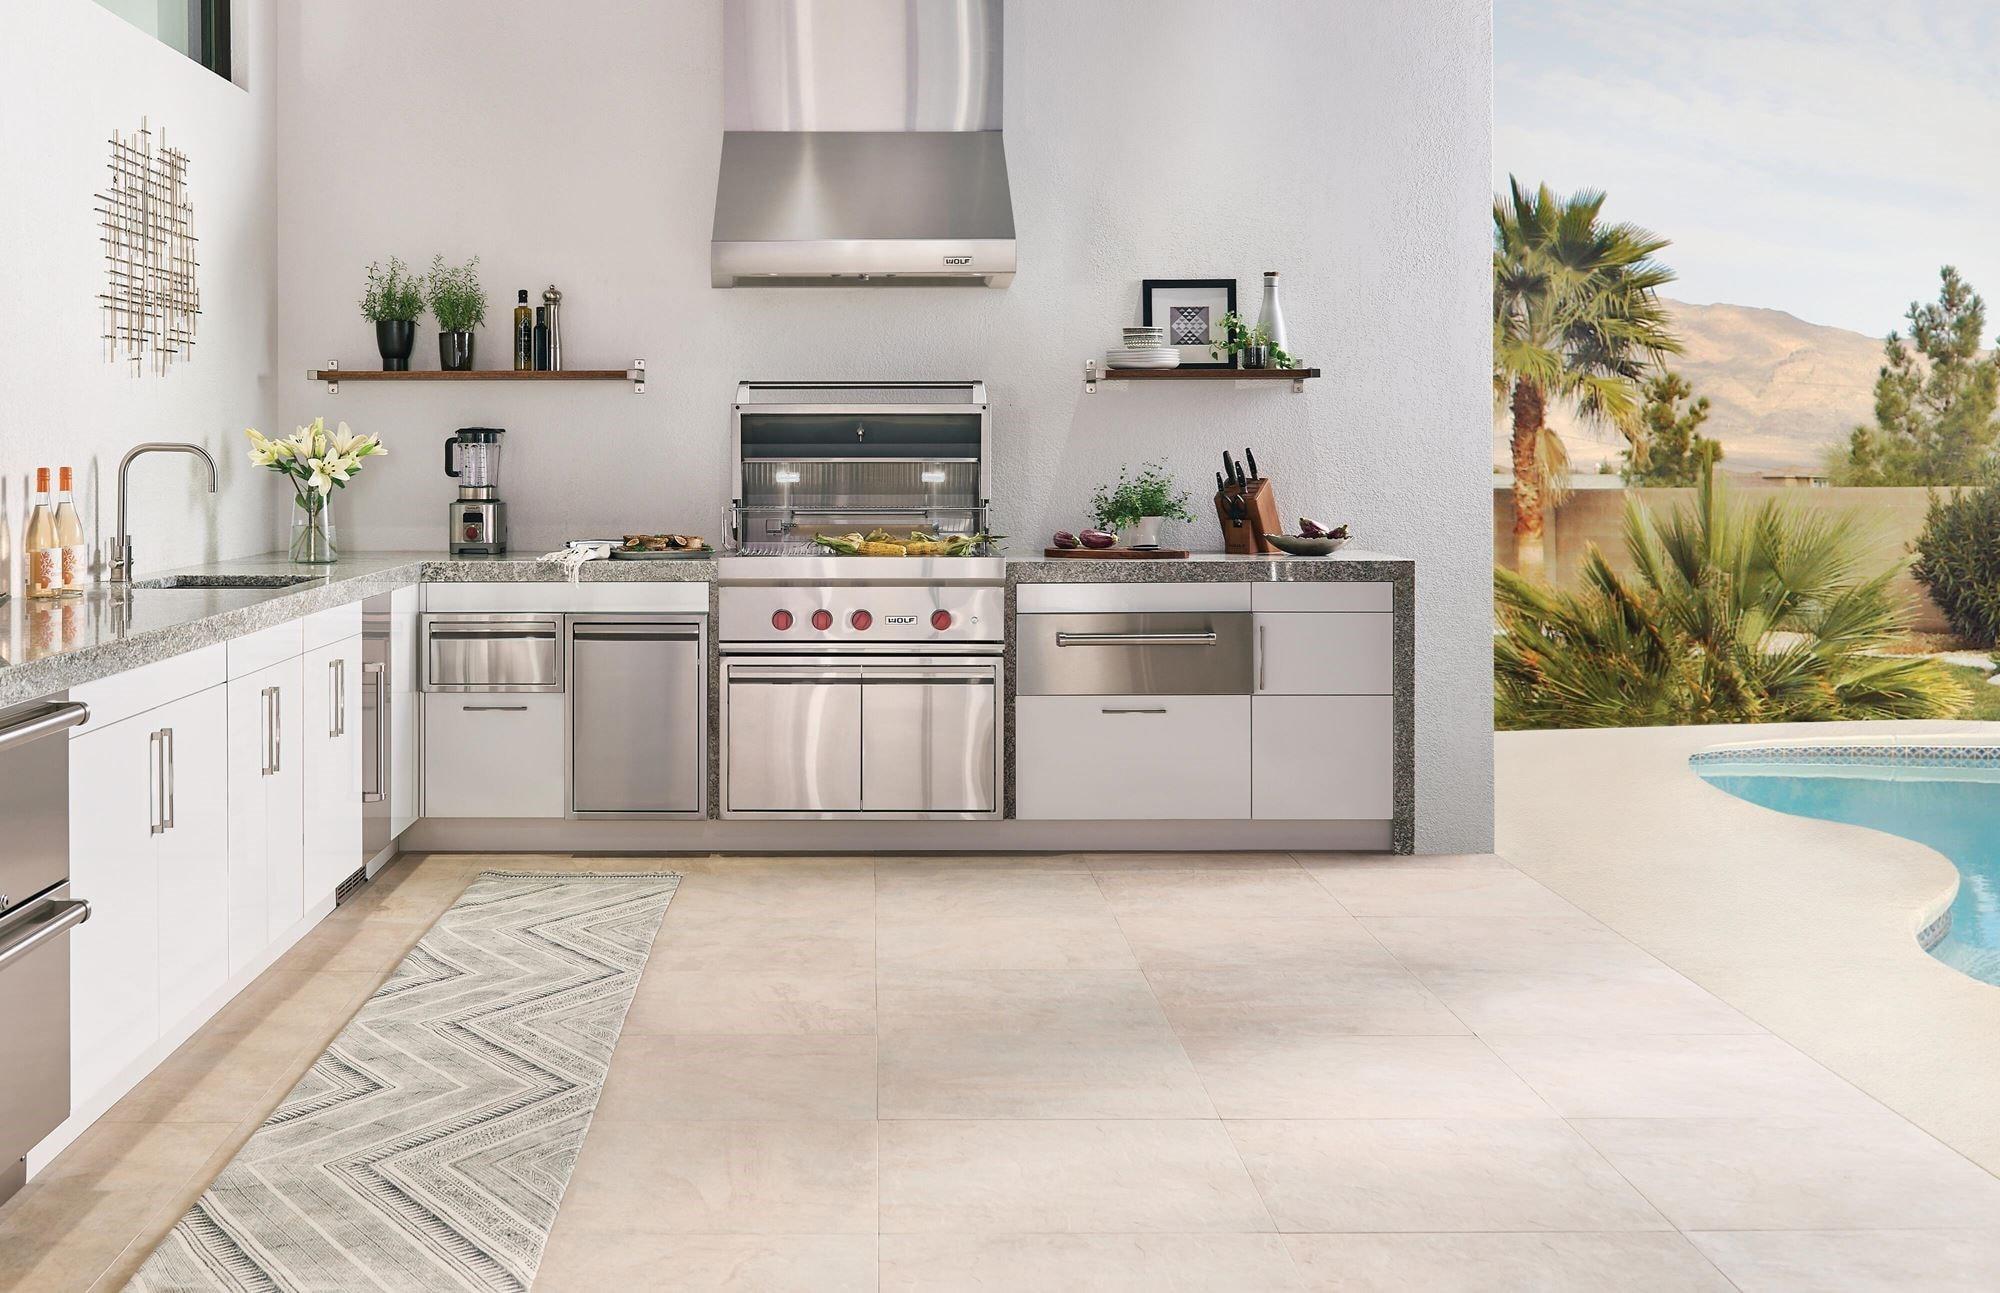 Groovy Outdoor Grills Built In Grills Wolf Outdoor Kitchens Interior Design Ideas Clesiryabchikinfo